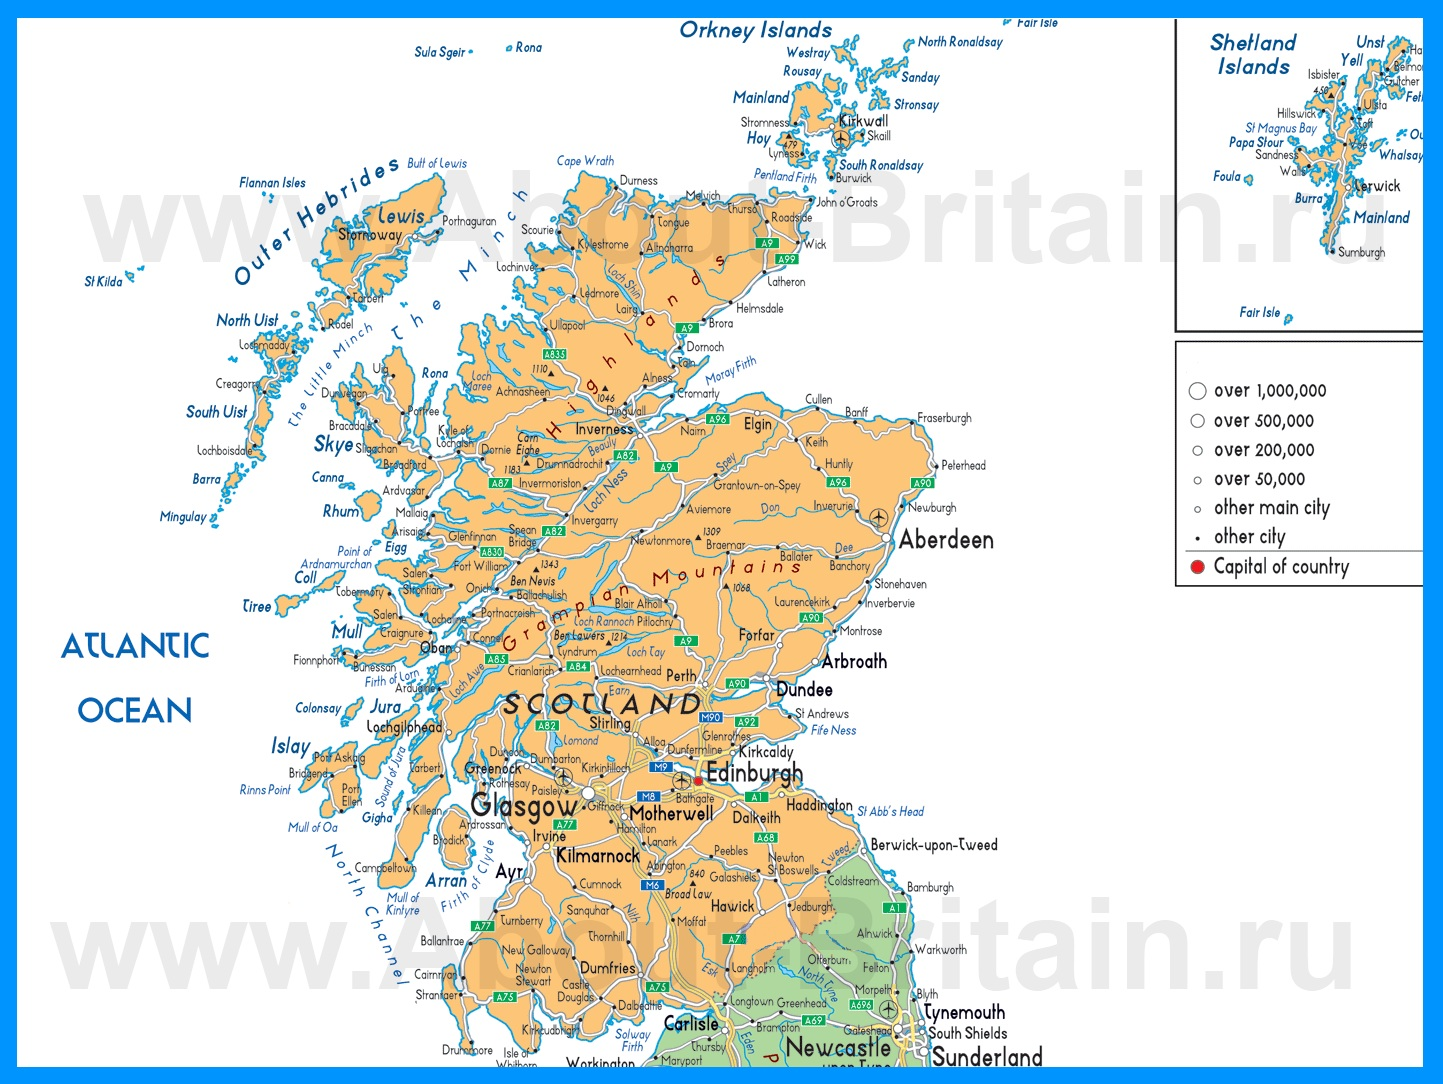 презентация шотландия на русском языке